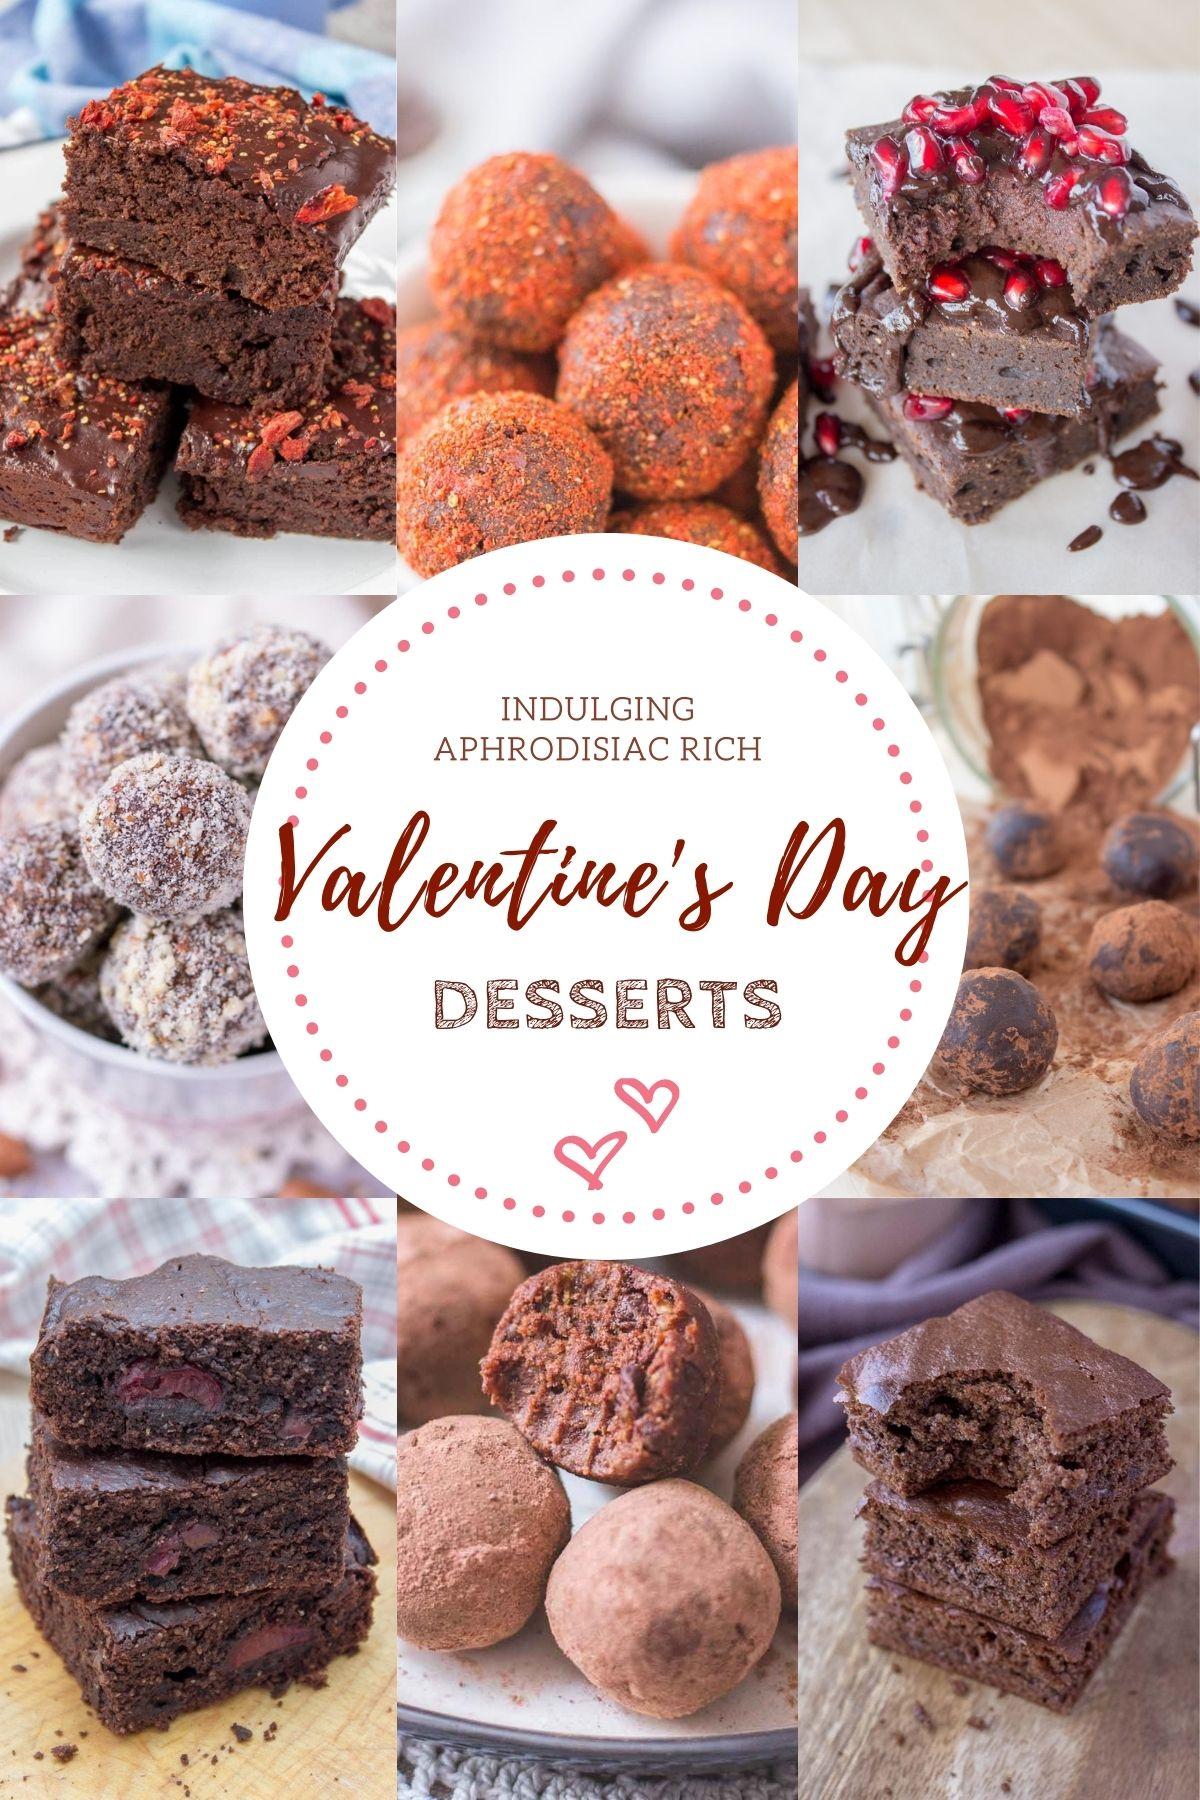 Valentine's Day Desserts roundup image